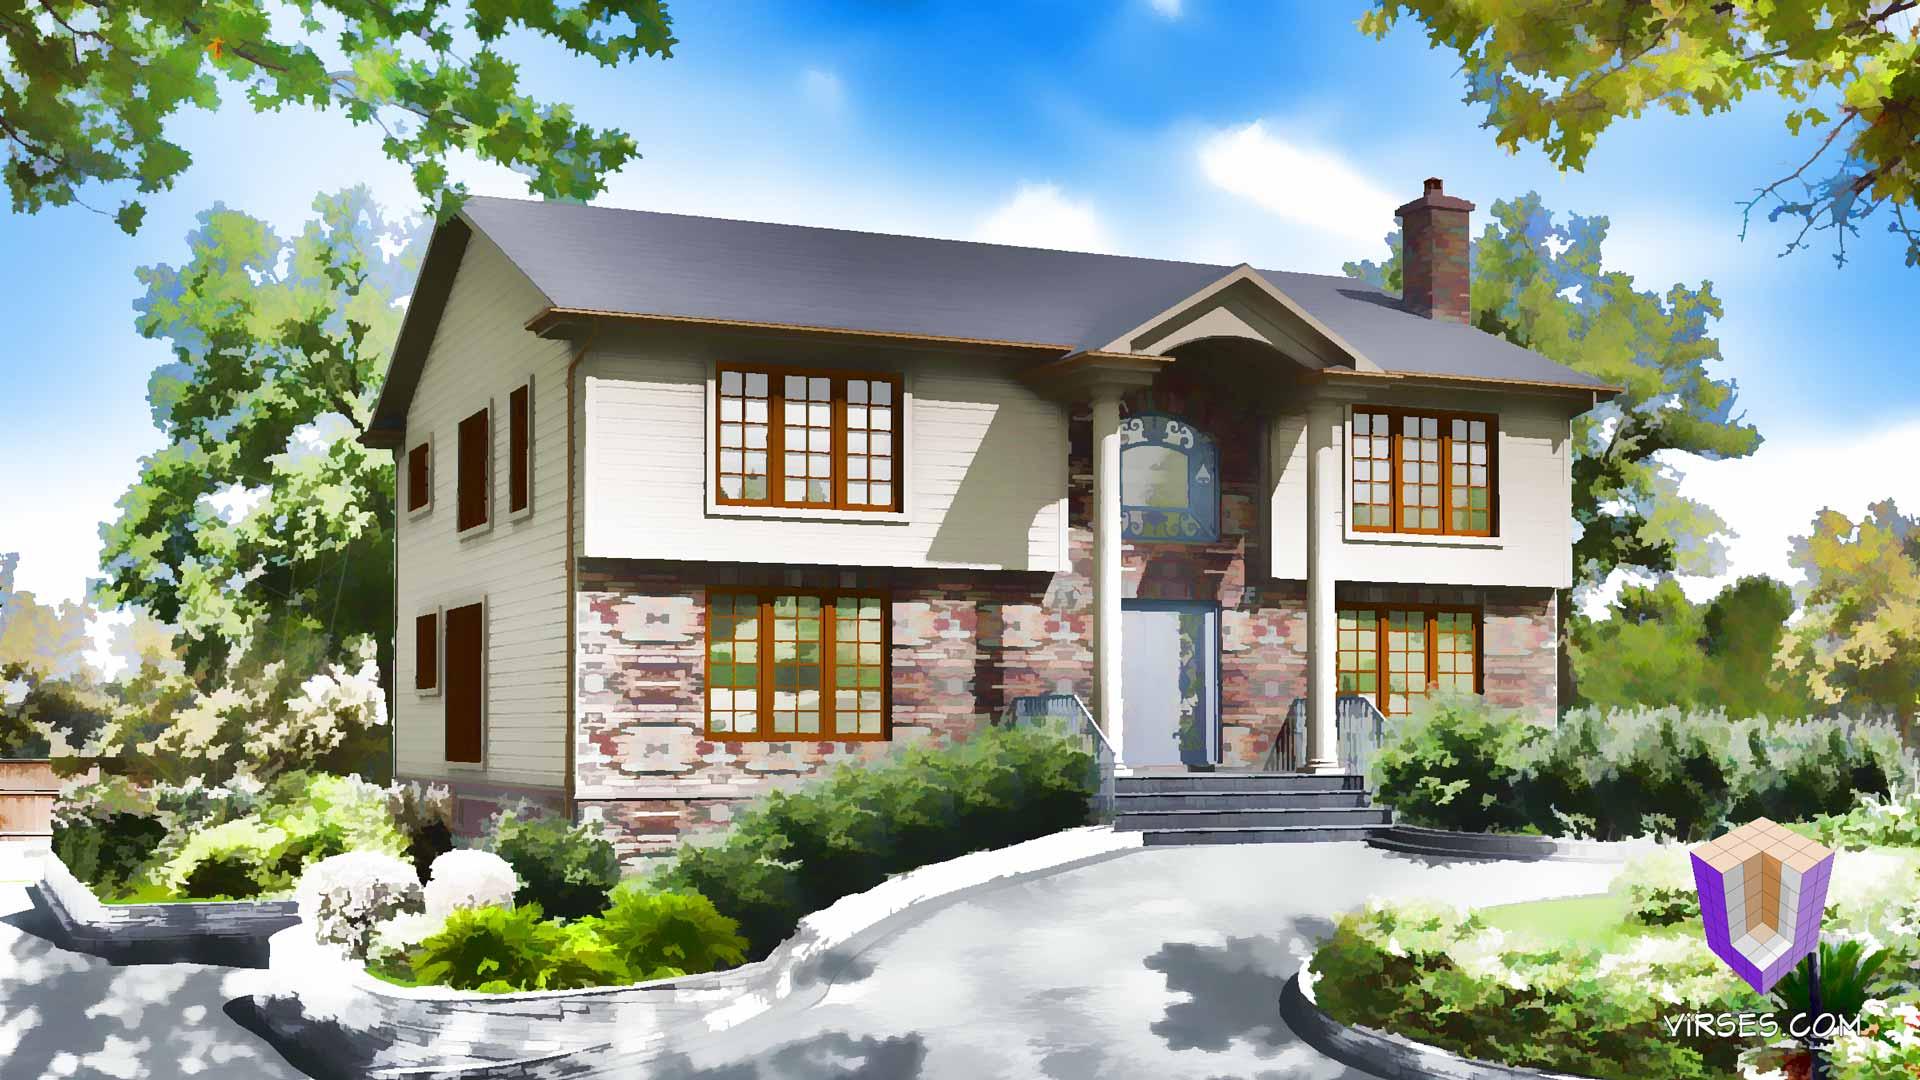 3d house visualizations